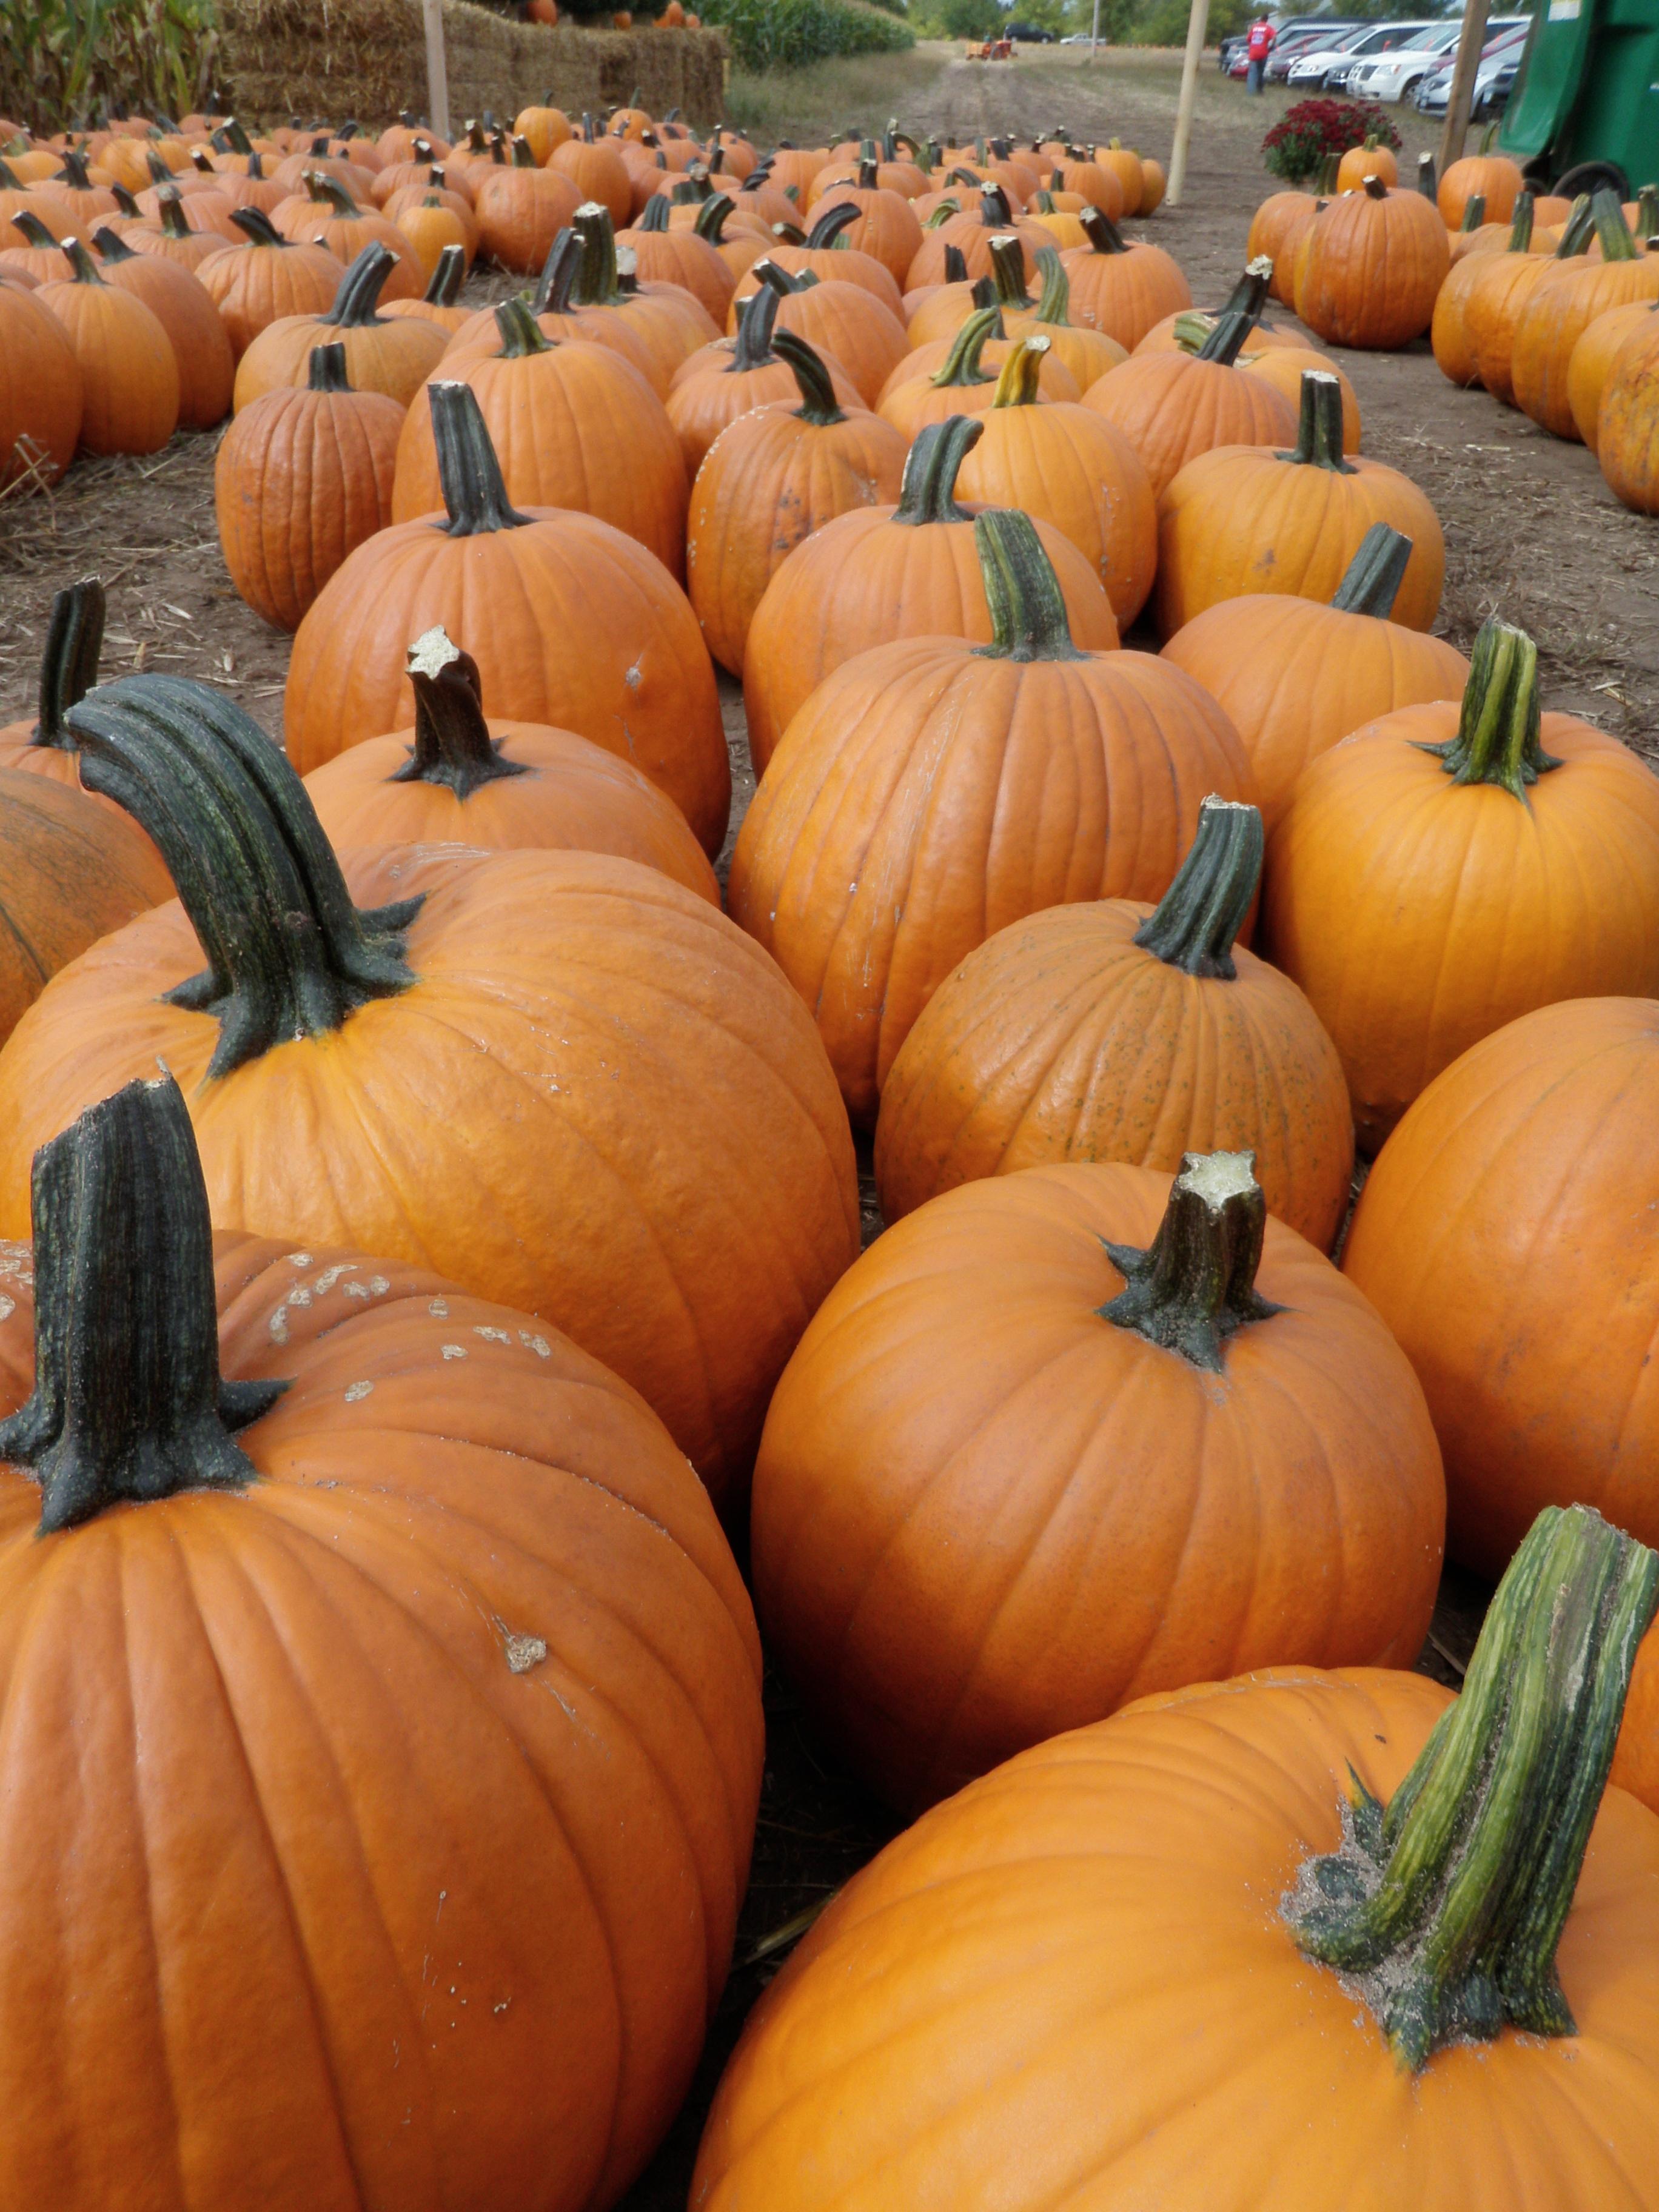 Twin Cities Harvest Festival & Maze Pumpkins Minneapolis Northwest